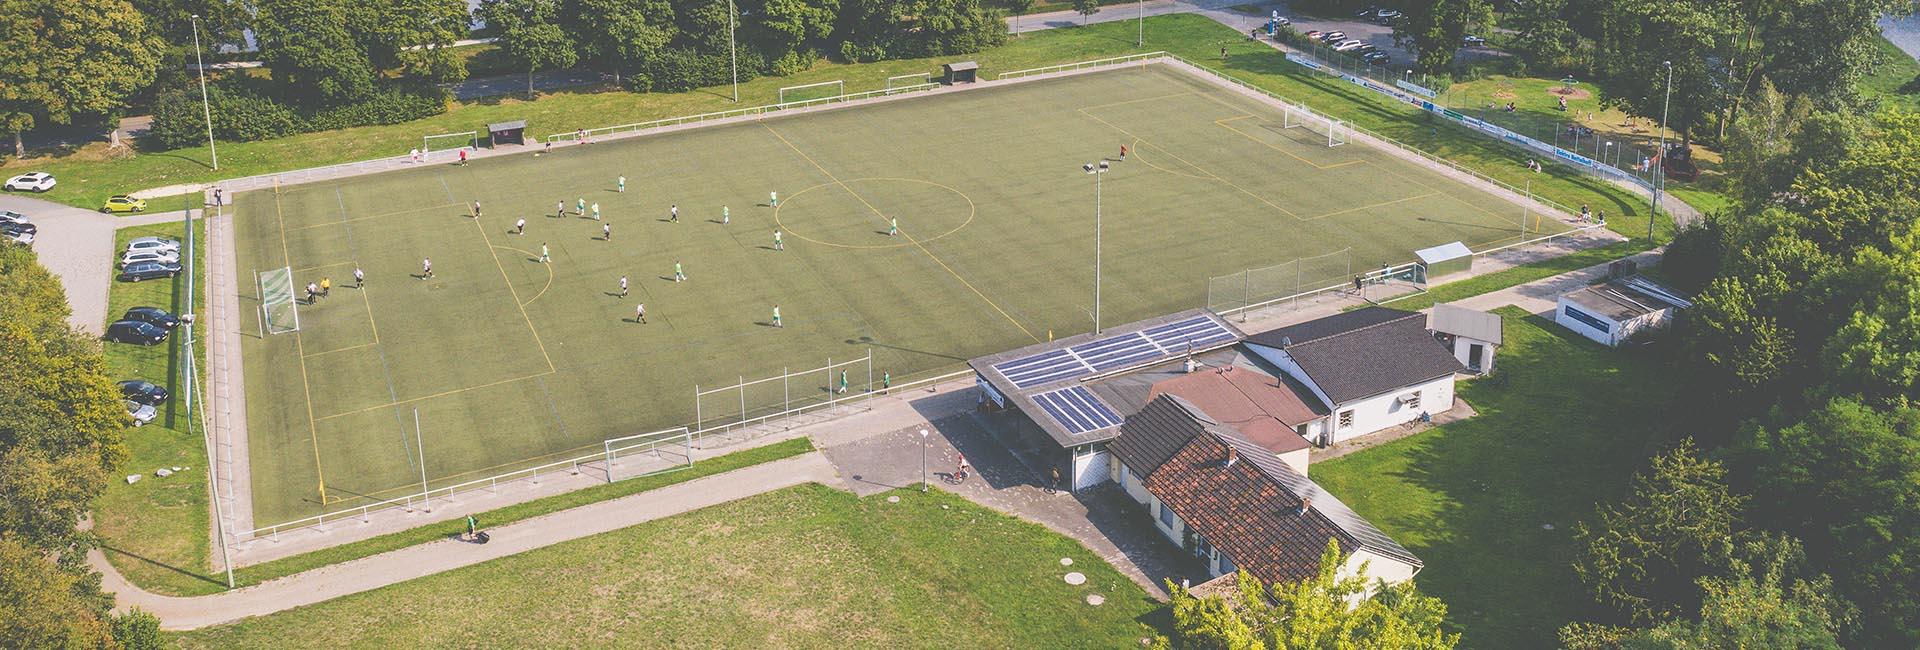 Sportplatz Drohne